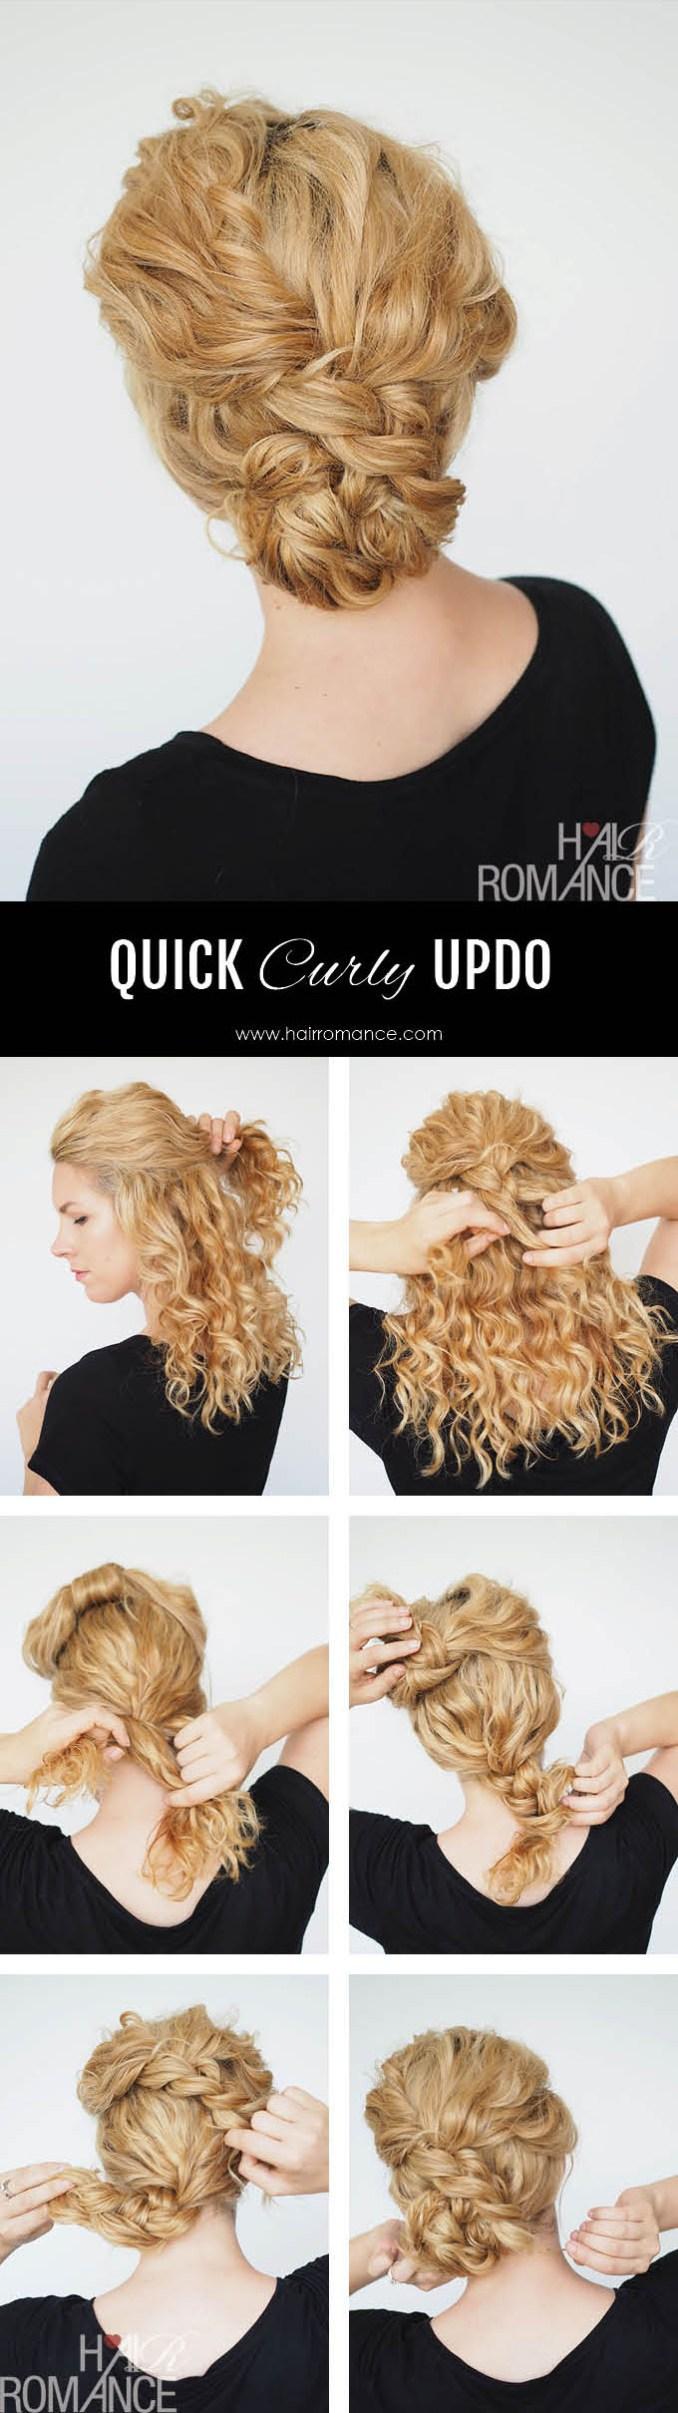 2 min updo for curly hair - hair romance